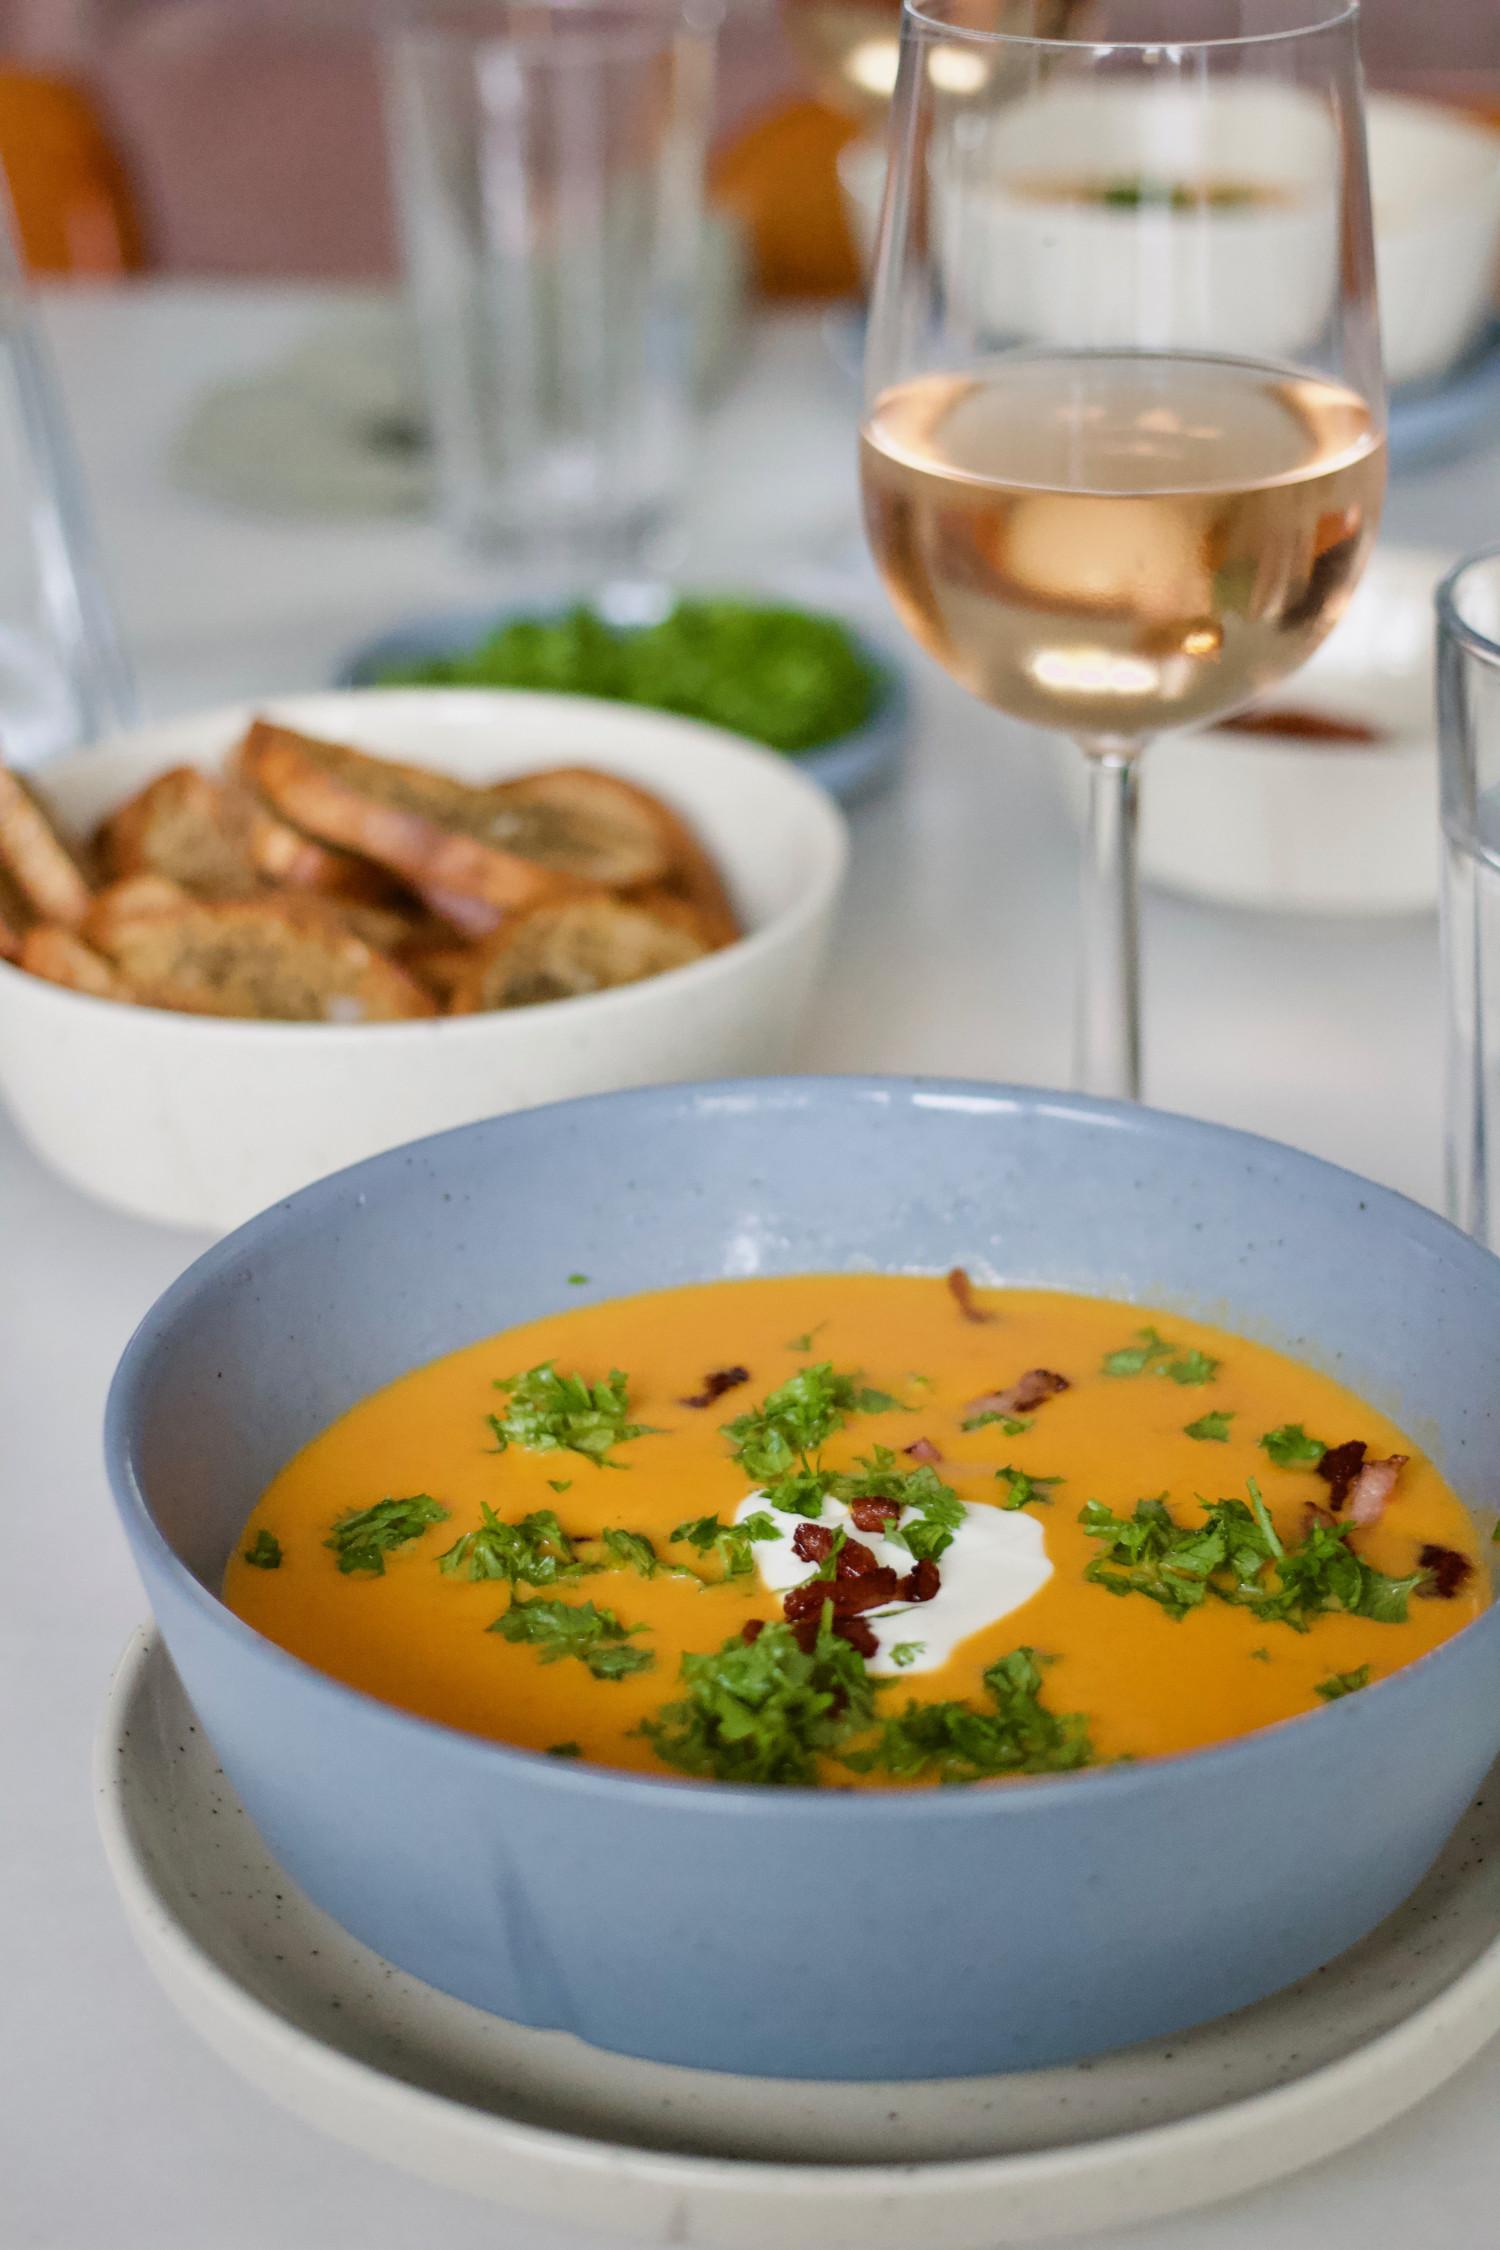 suppe med græskar Annemette Voss